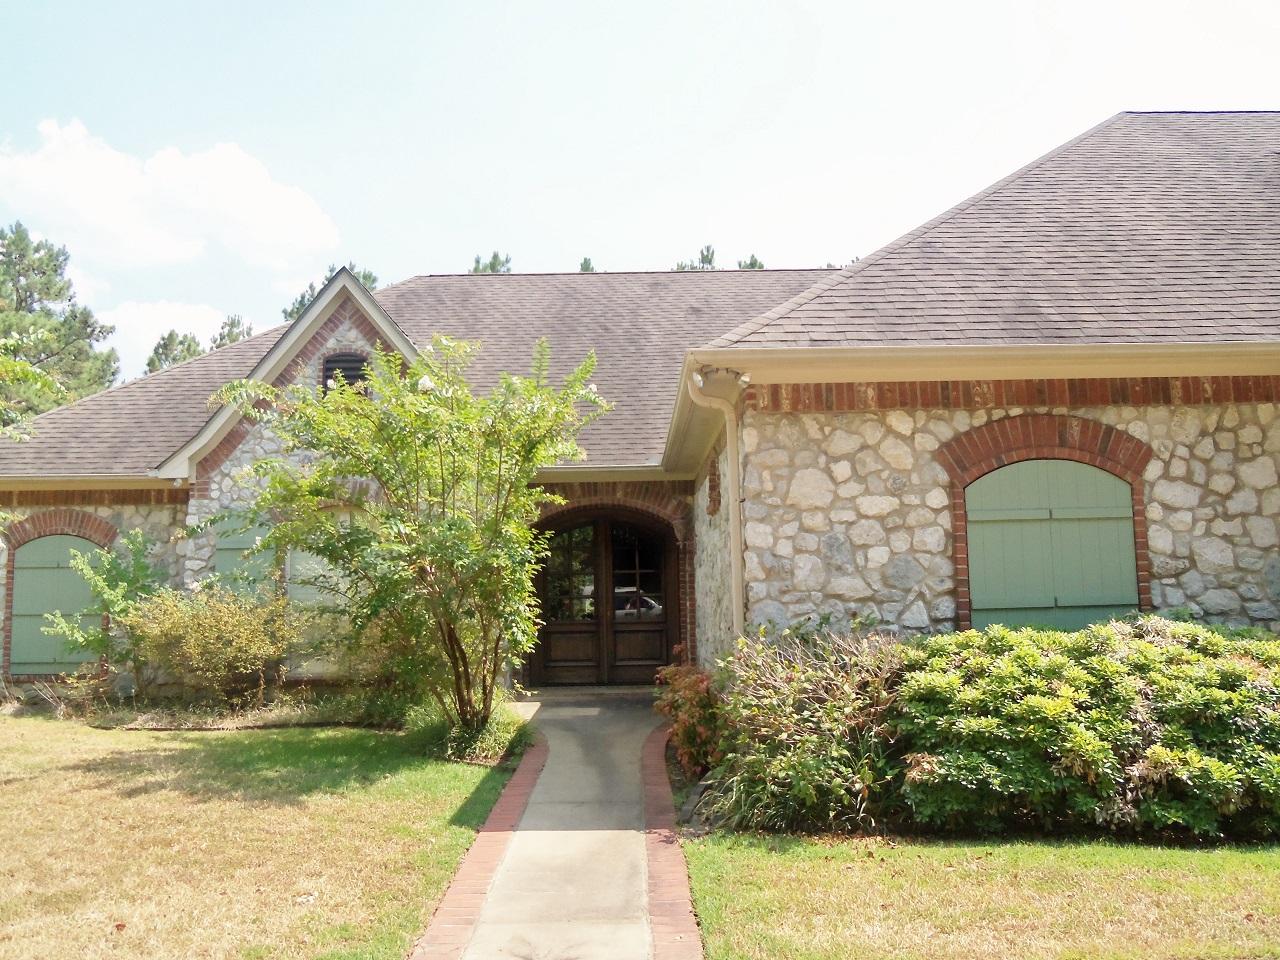 1400 E. Main, Henderson, Texas 75652